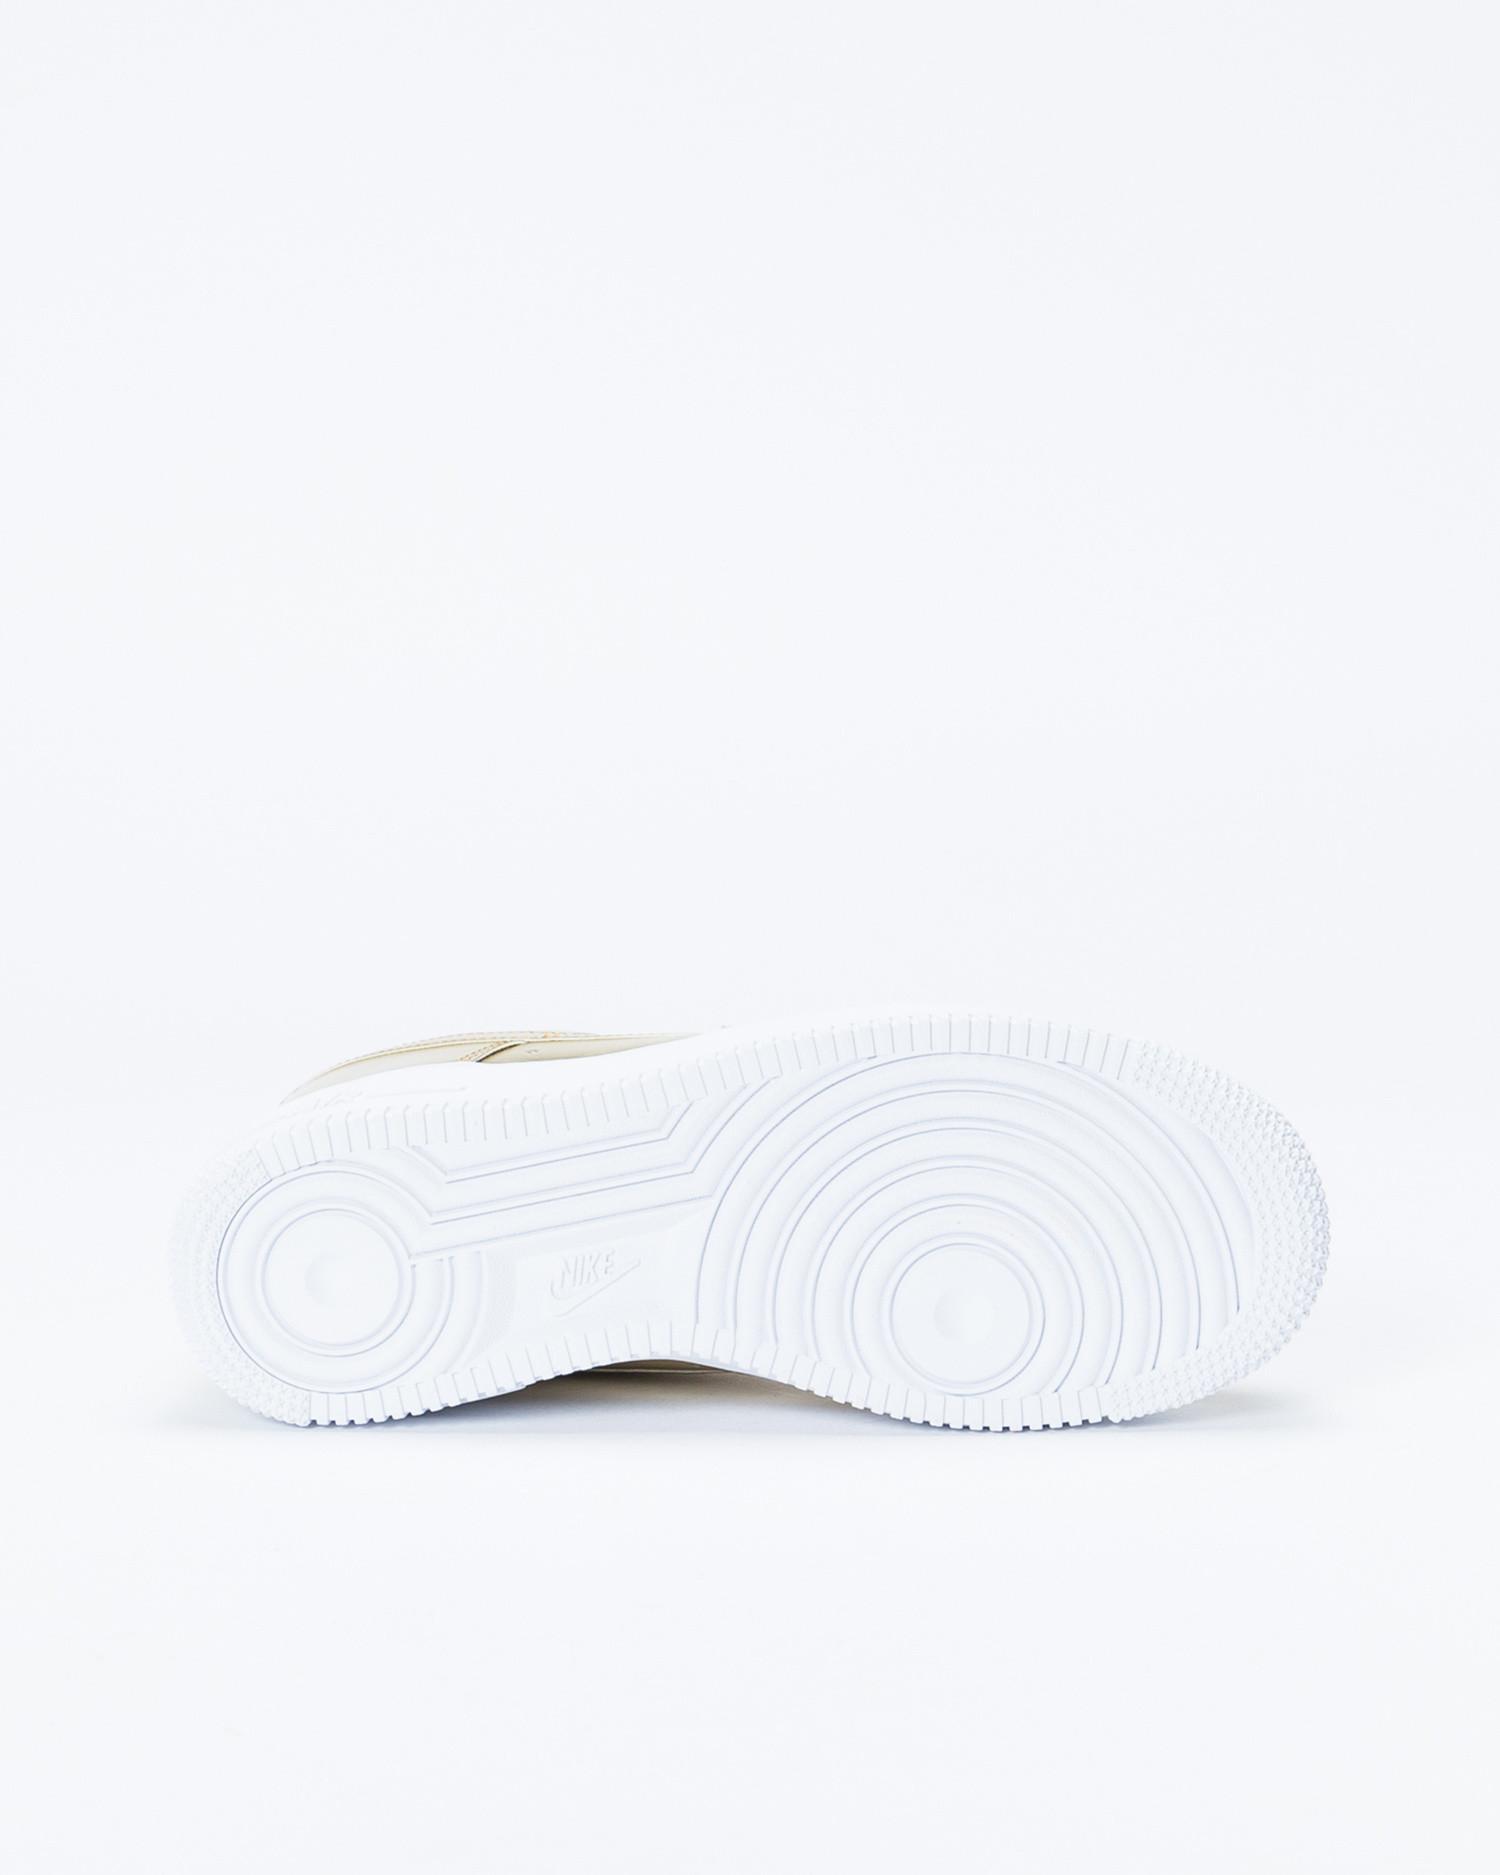 Nike Womens Air Force 1 SP Metallic Gold/Club Gold-White